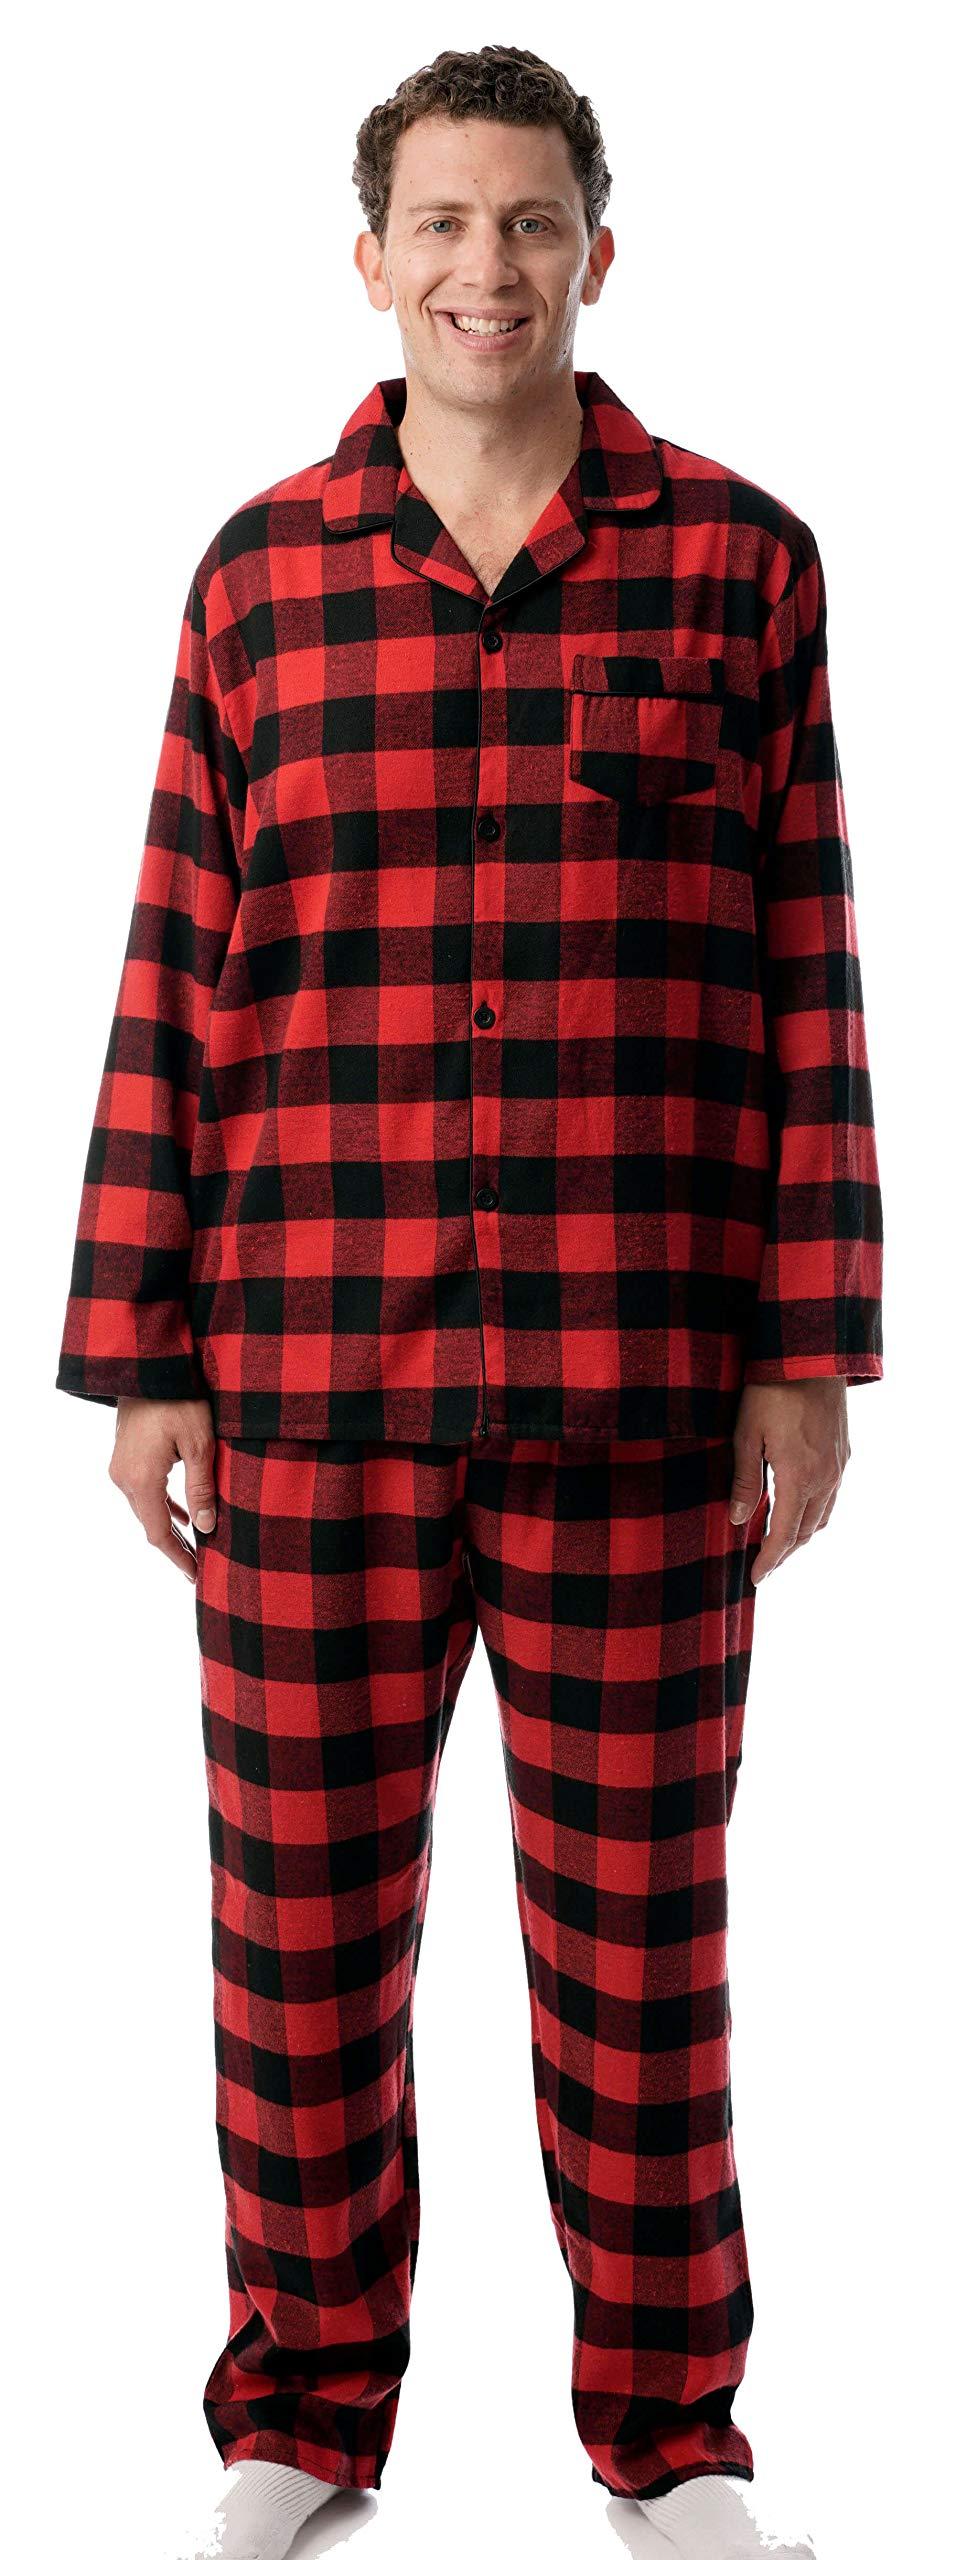 followme Mens Flannel Pajama 44917 1A L